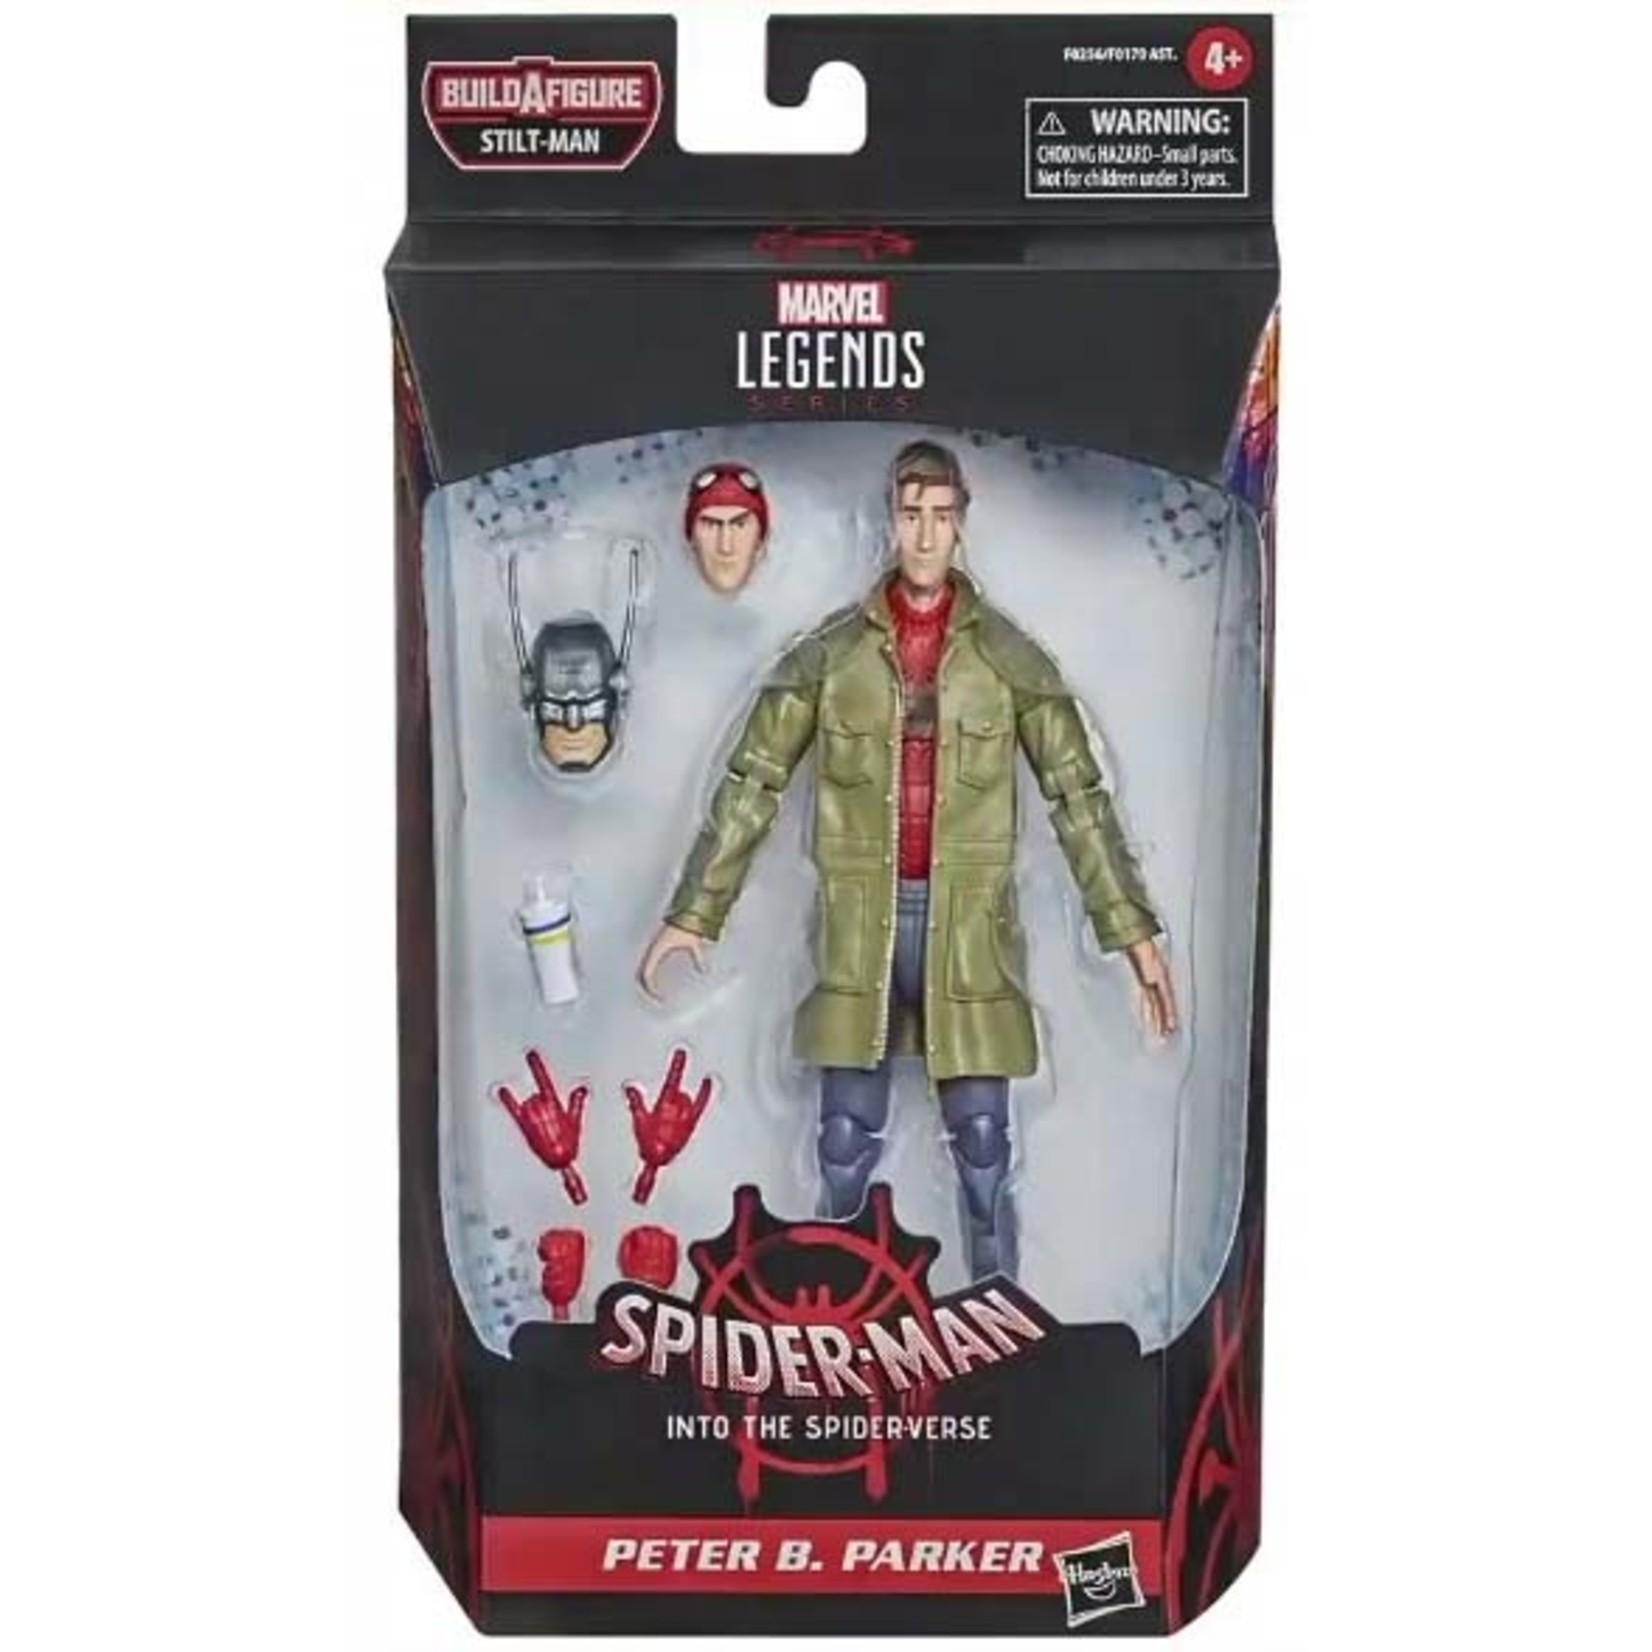 Hasbro Spider-Man: Into the Spider-Verse Marvel Legends Peter B. Parker (Stilt-Man BAF)